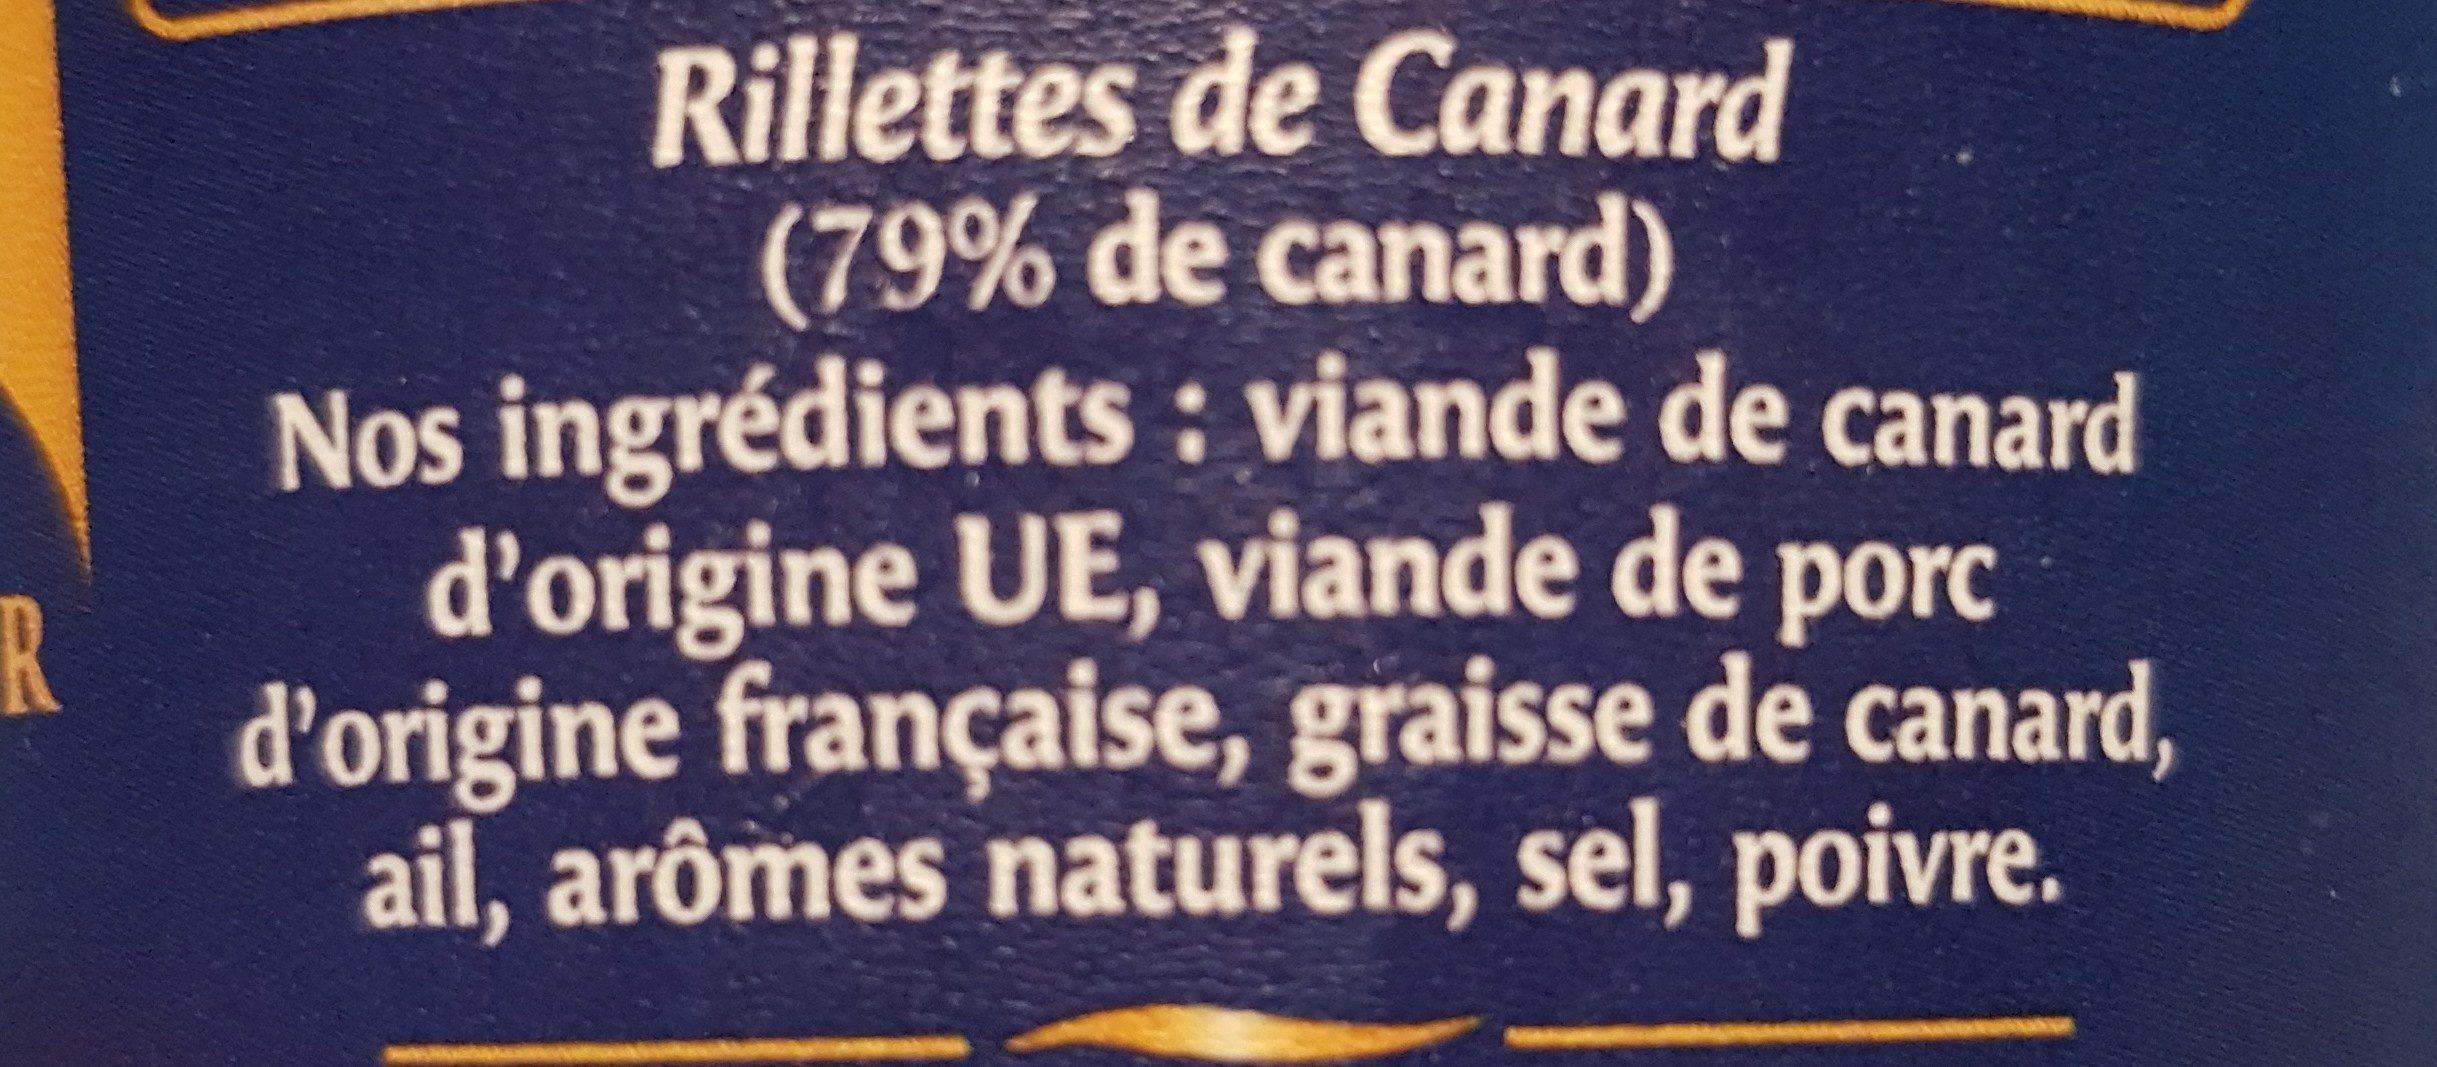 Fines rillettes Canard - Ingrédients